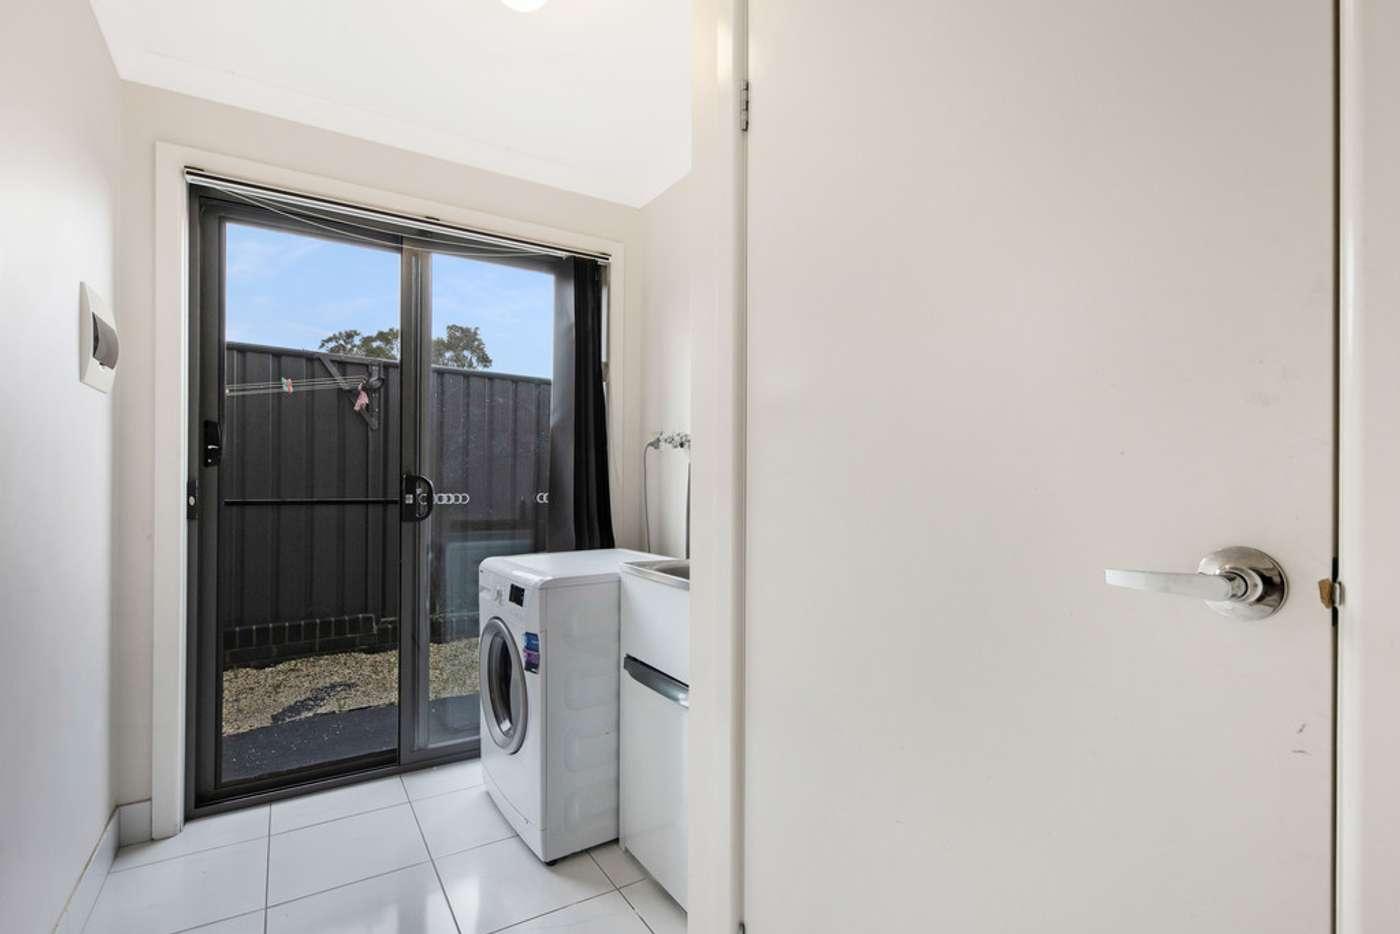 Sixth view of Homely house listing, 11 McAuliffe Street, Wodonga VIC 3690